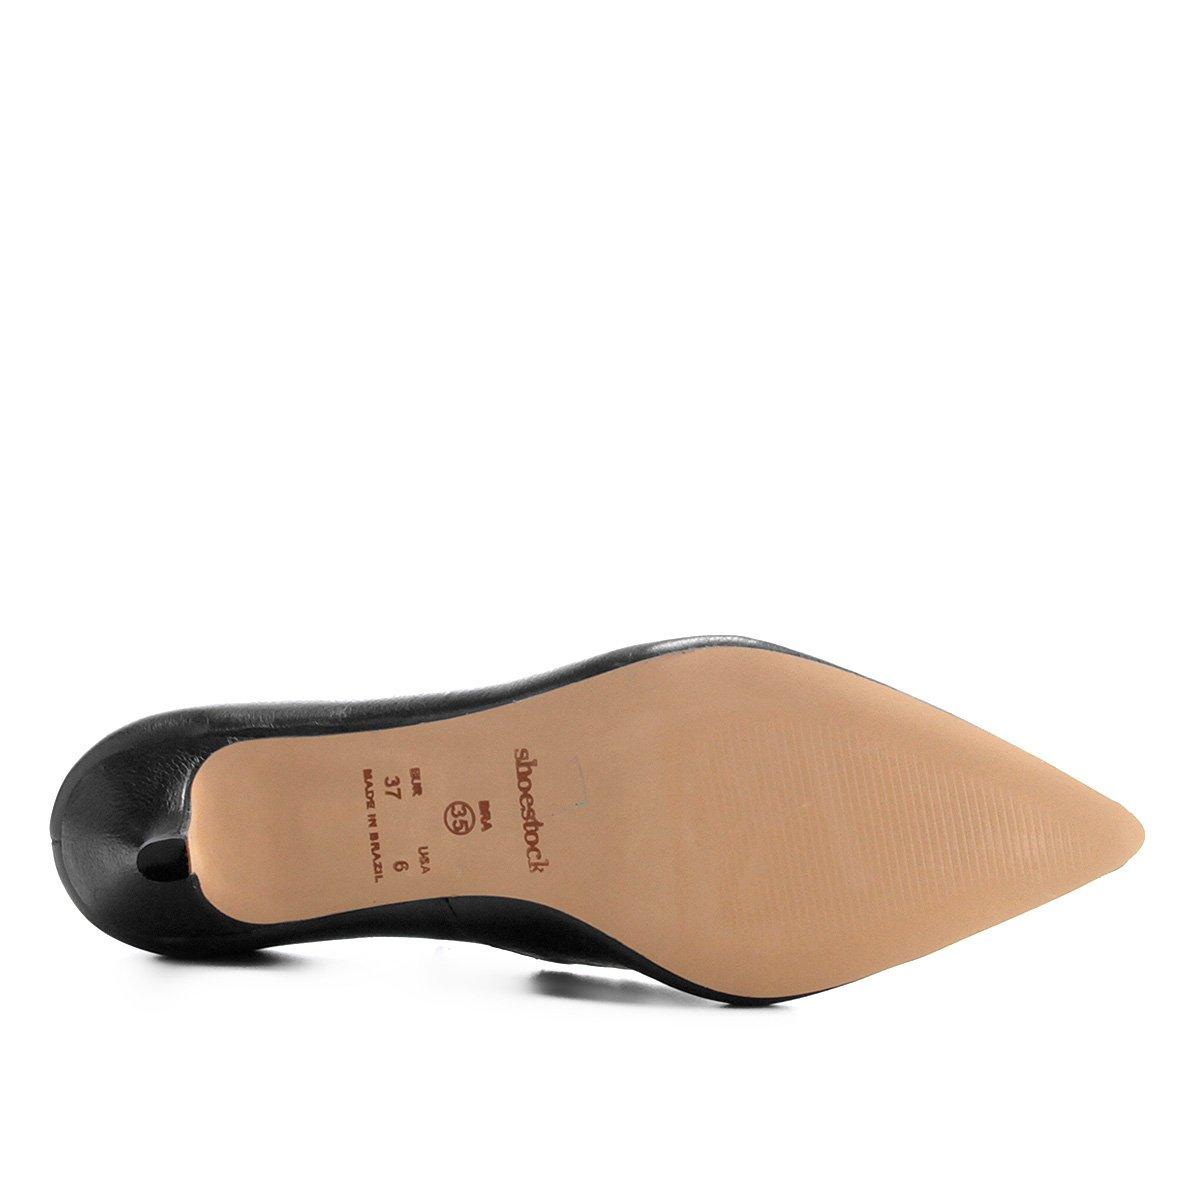 Scarpin Couro Salto Couro Baixo Shoestock Preto Scarpin Preto Couro Salto Shoestock Baixo Scarpin qTpwSfRpEO